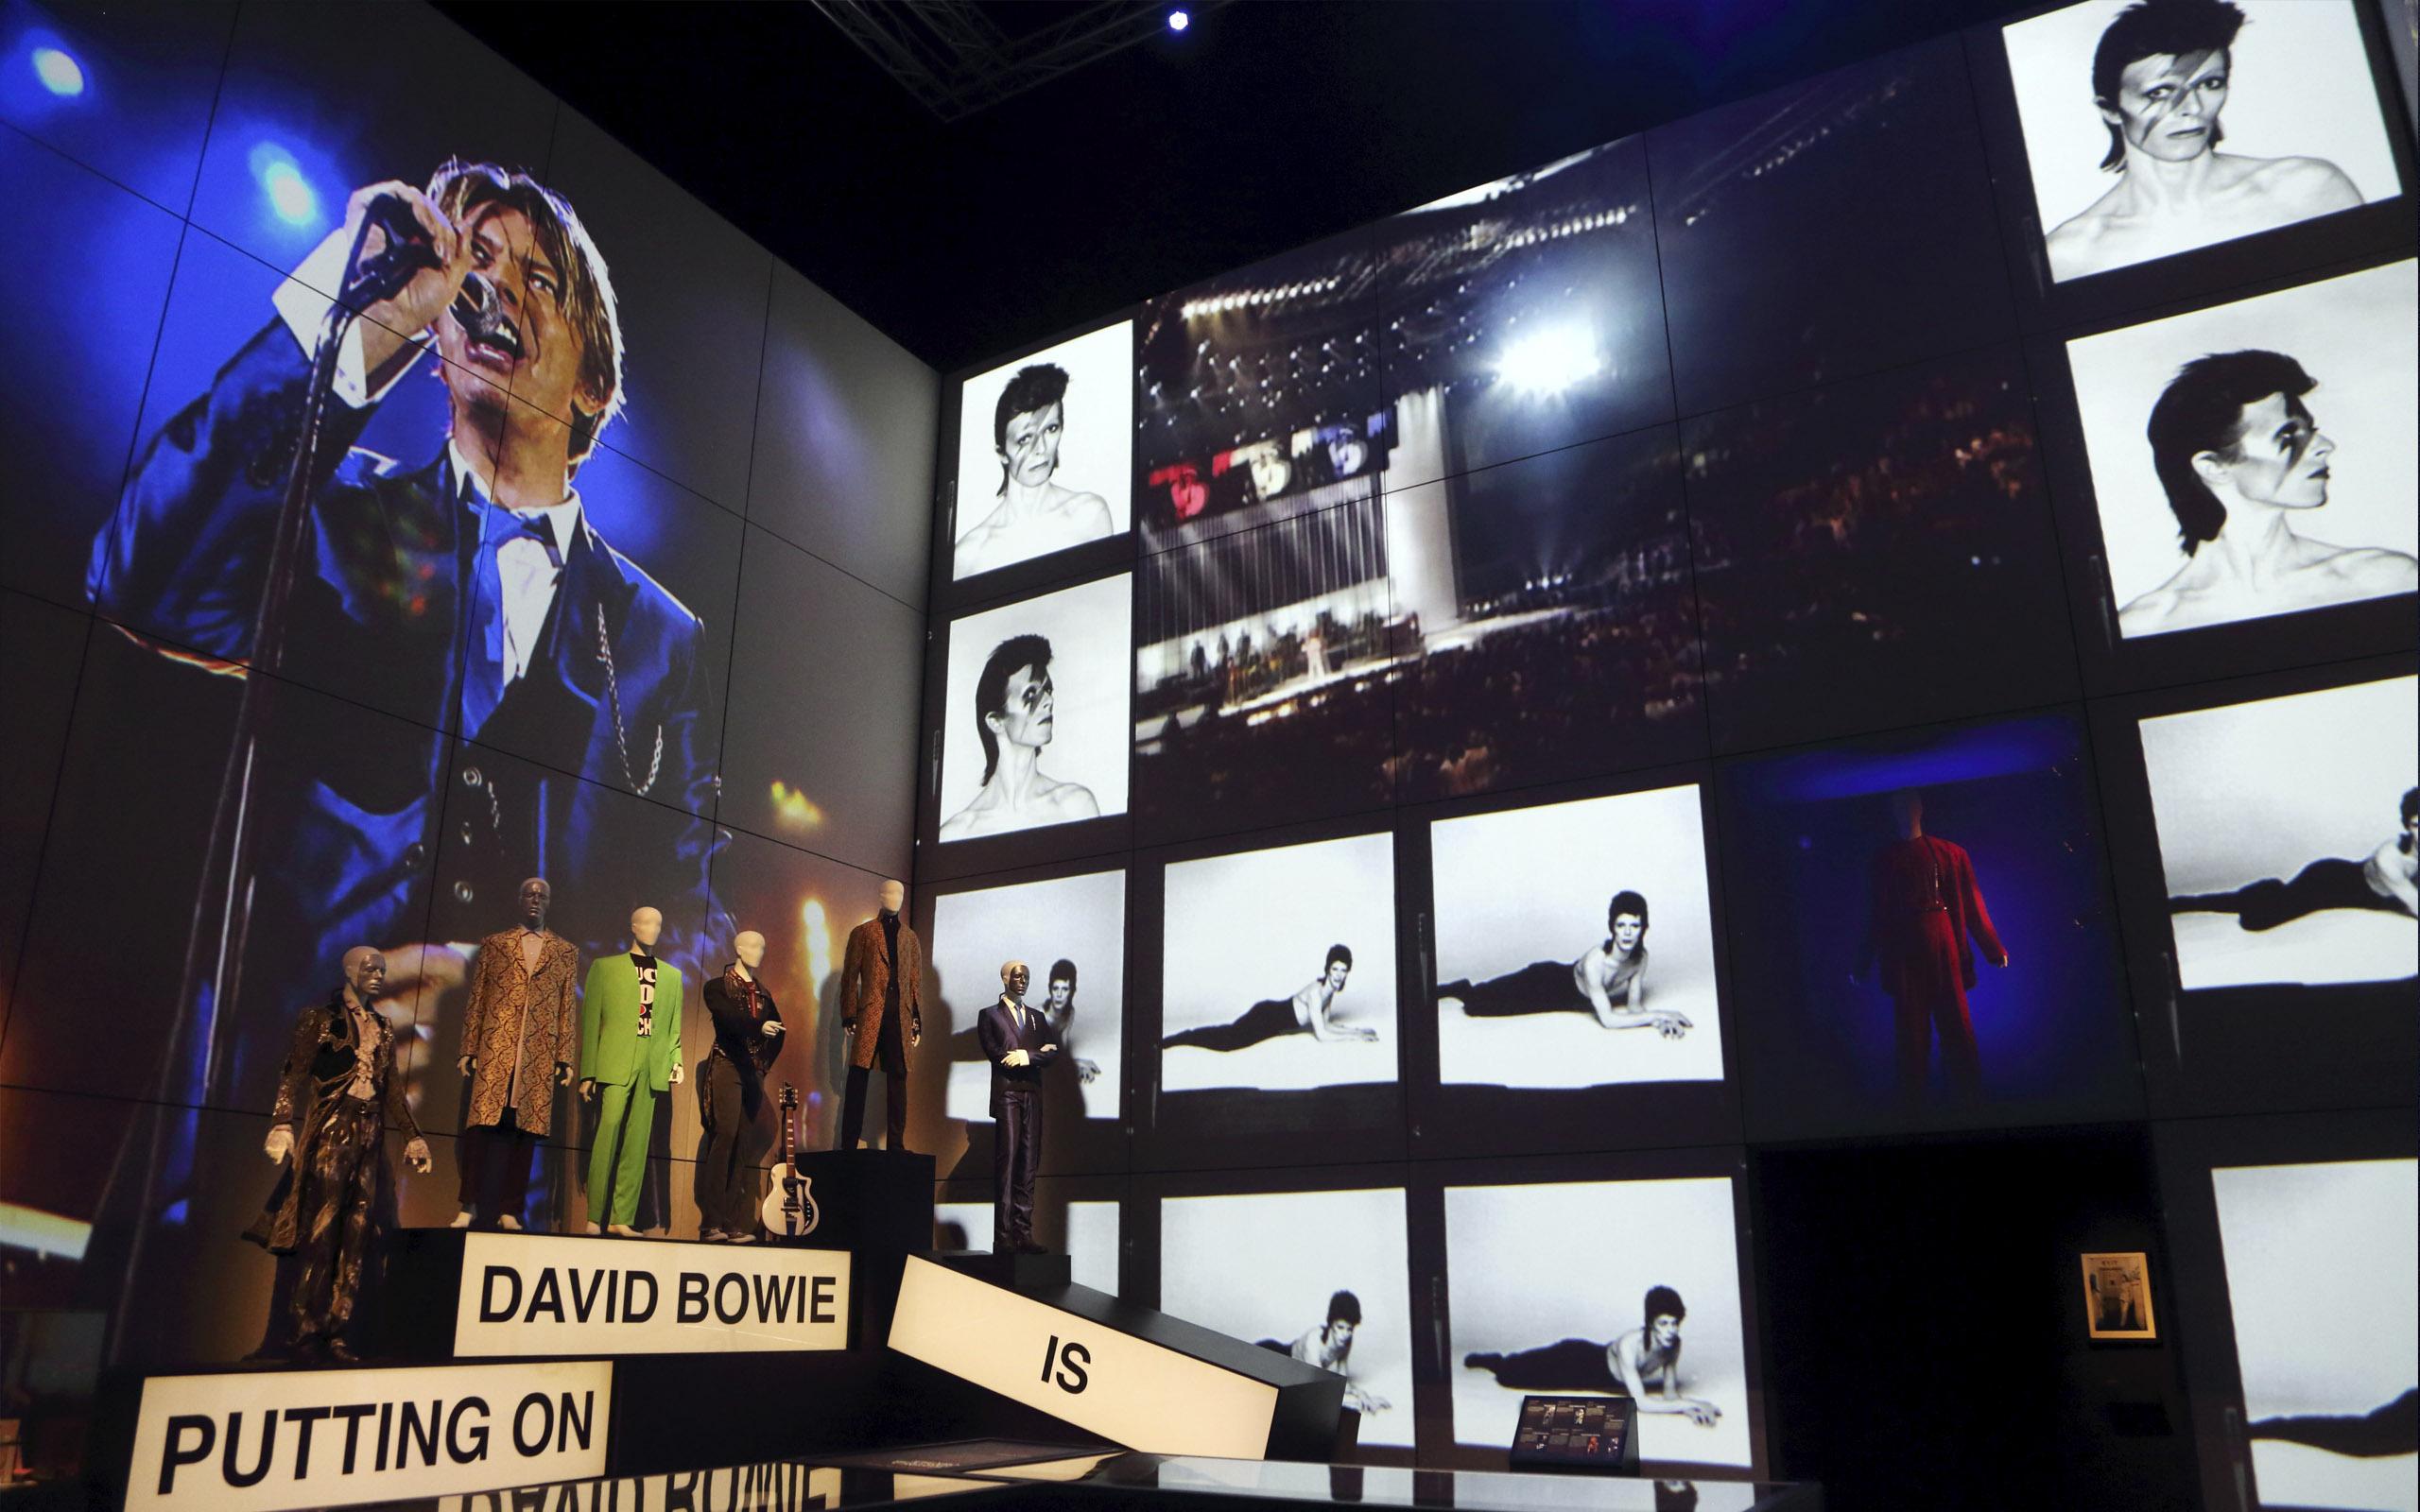 「DAVID BOWIE is」展が日本上陸、行く前に知っておきたい5つの見所をおさらい